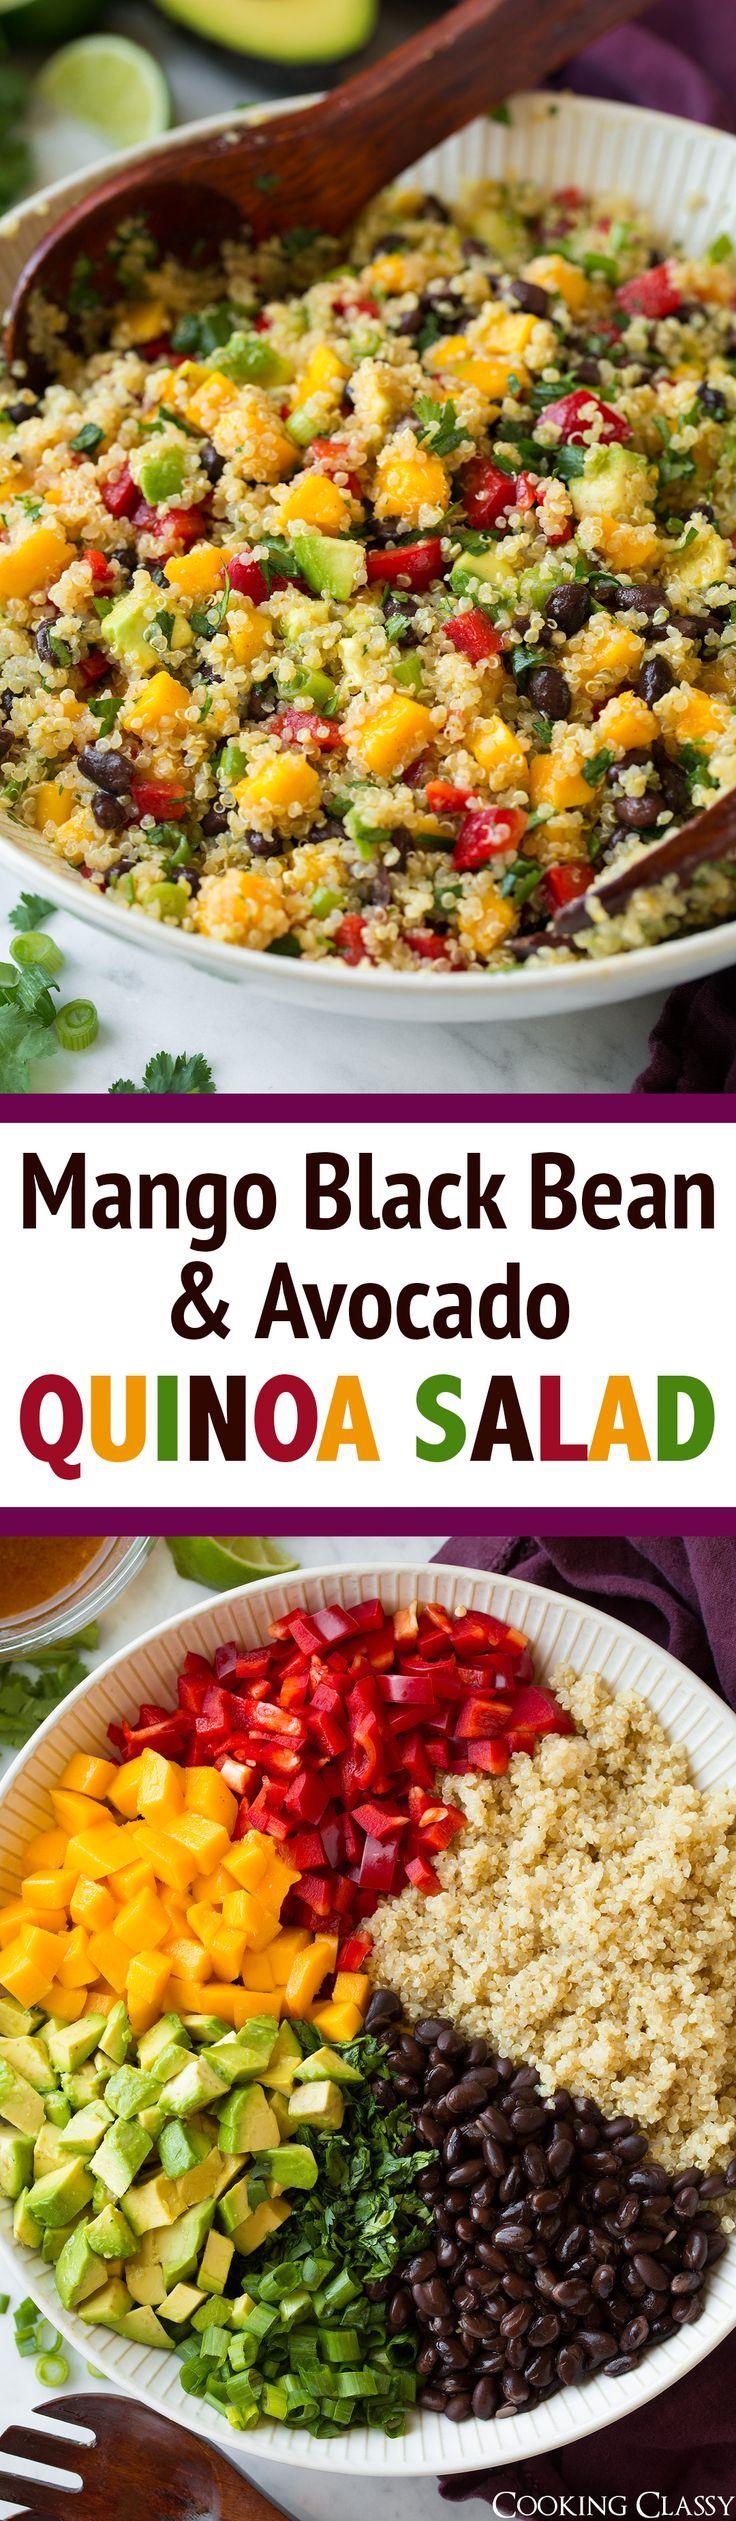 Mango Black Bean and Avocado Quinoa Salad - Cooking Classy